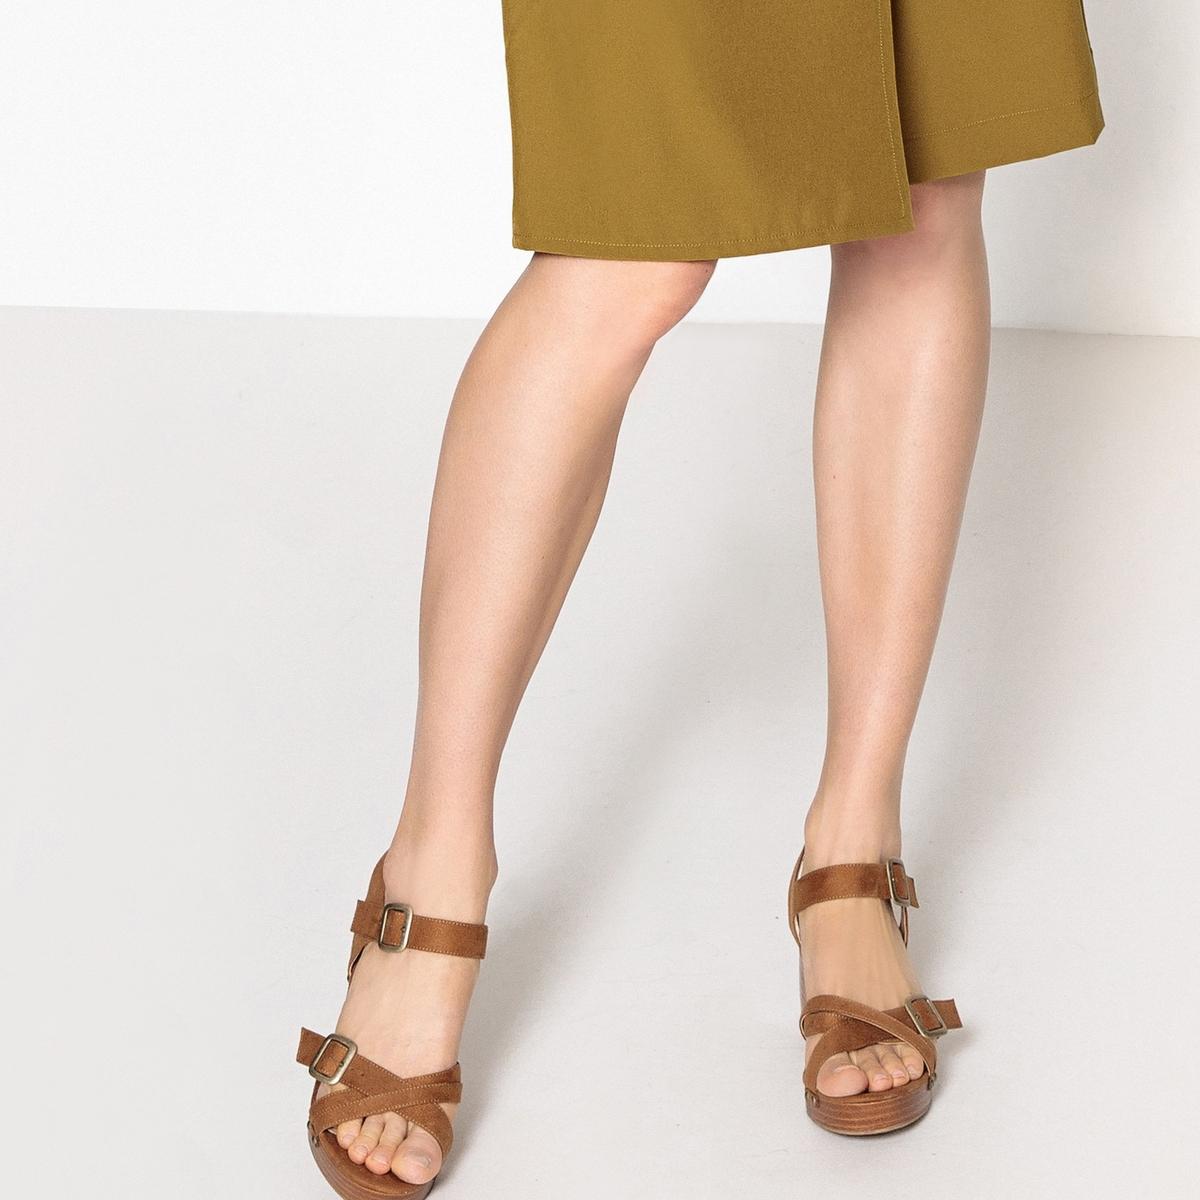 Sandalias con plataforma y detalle de tachuelas